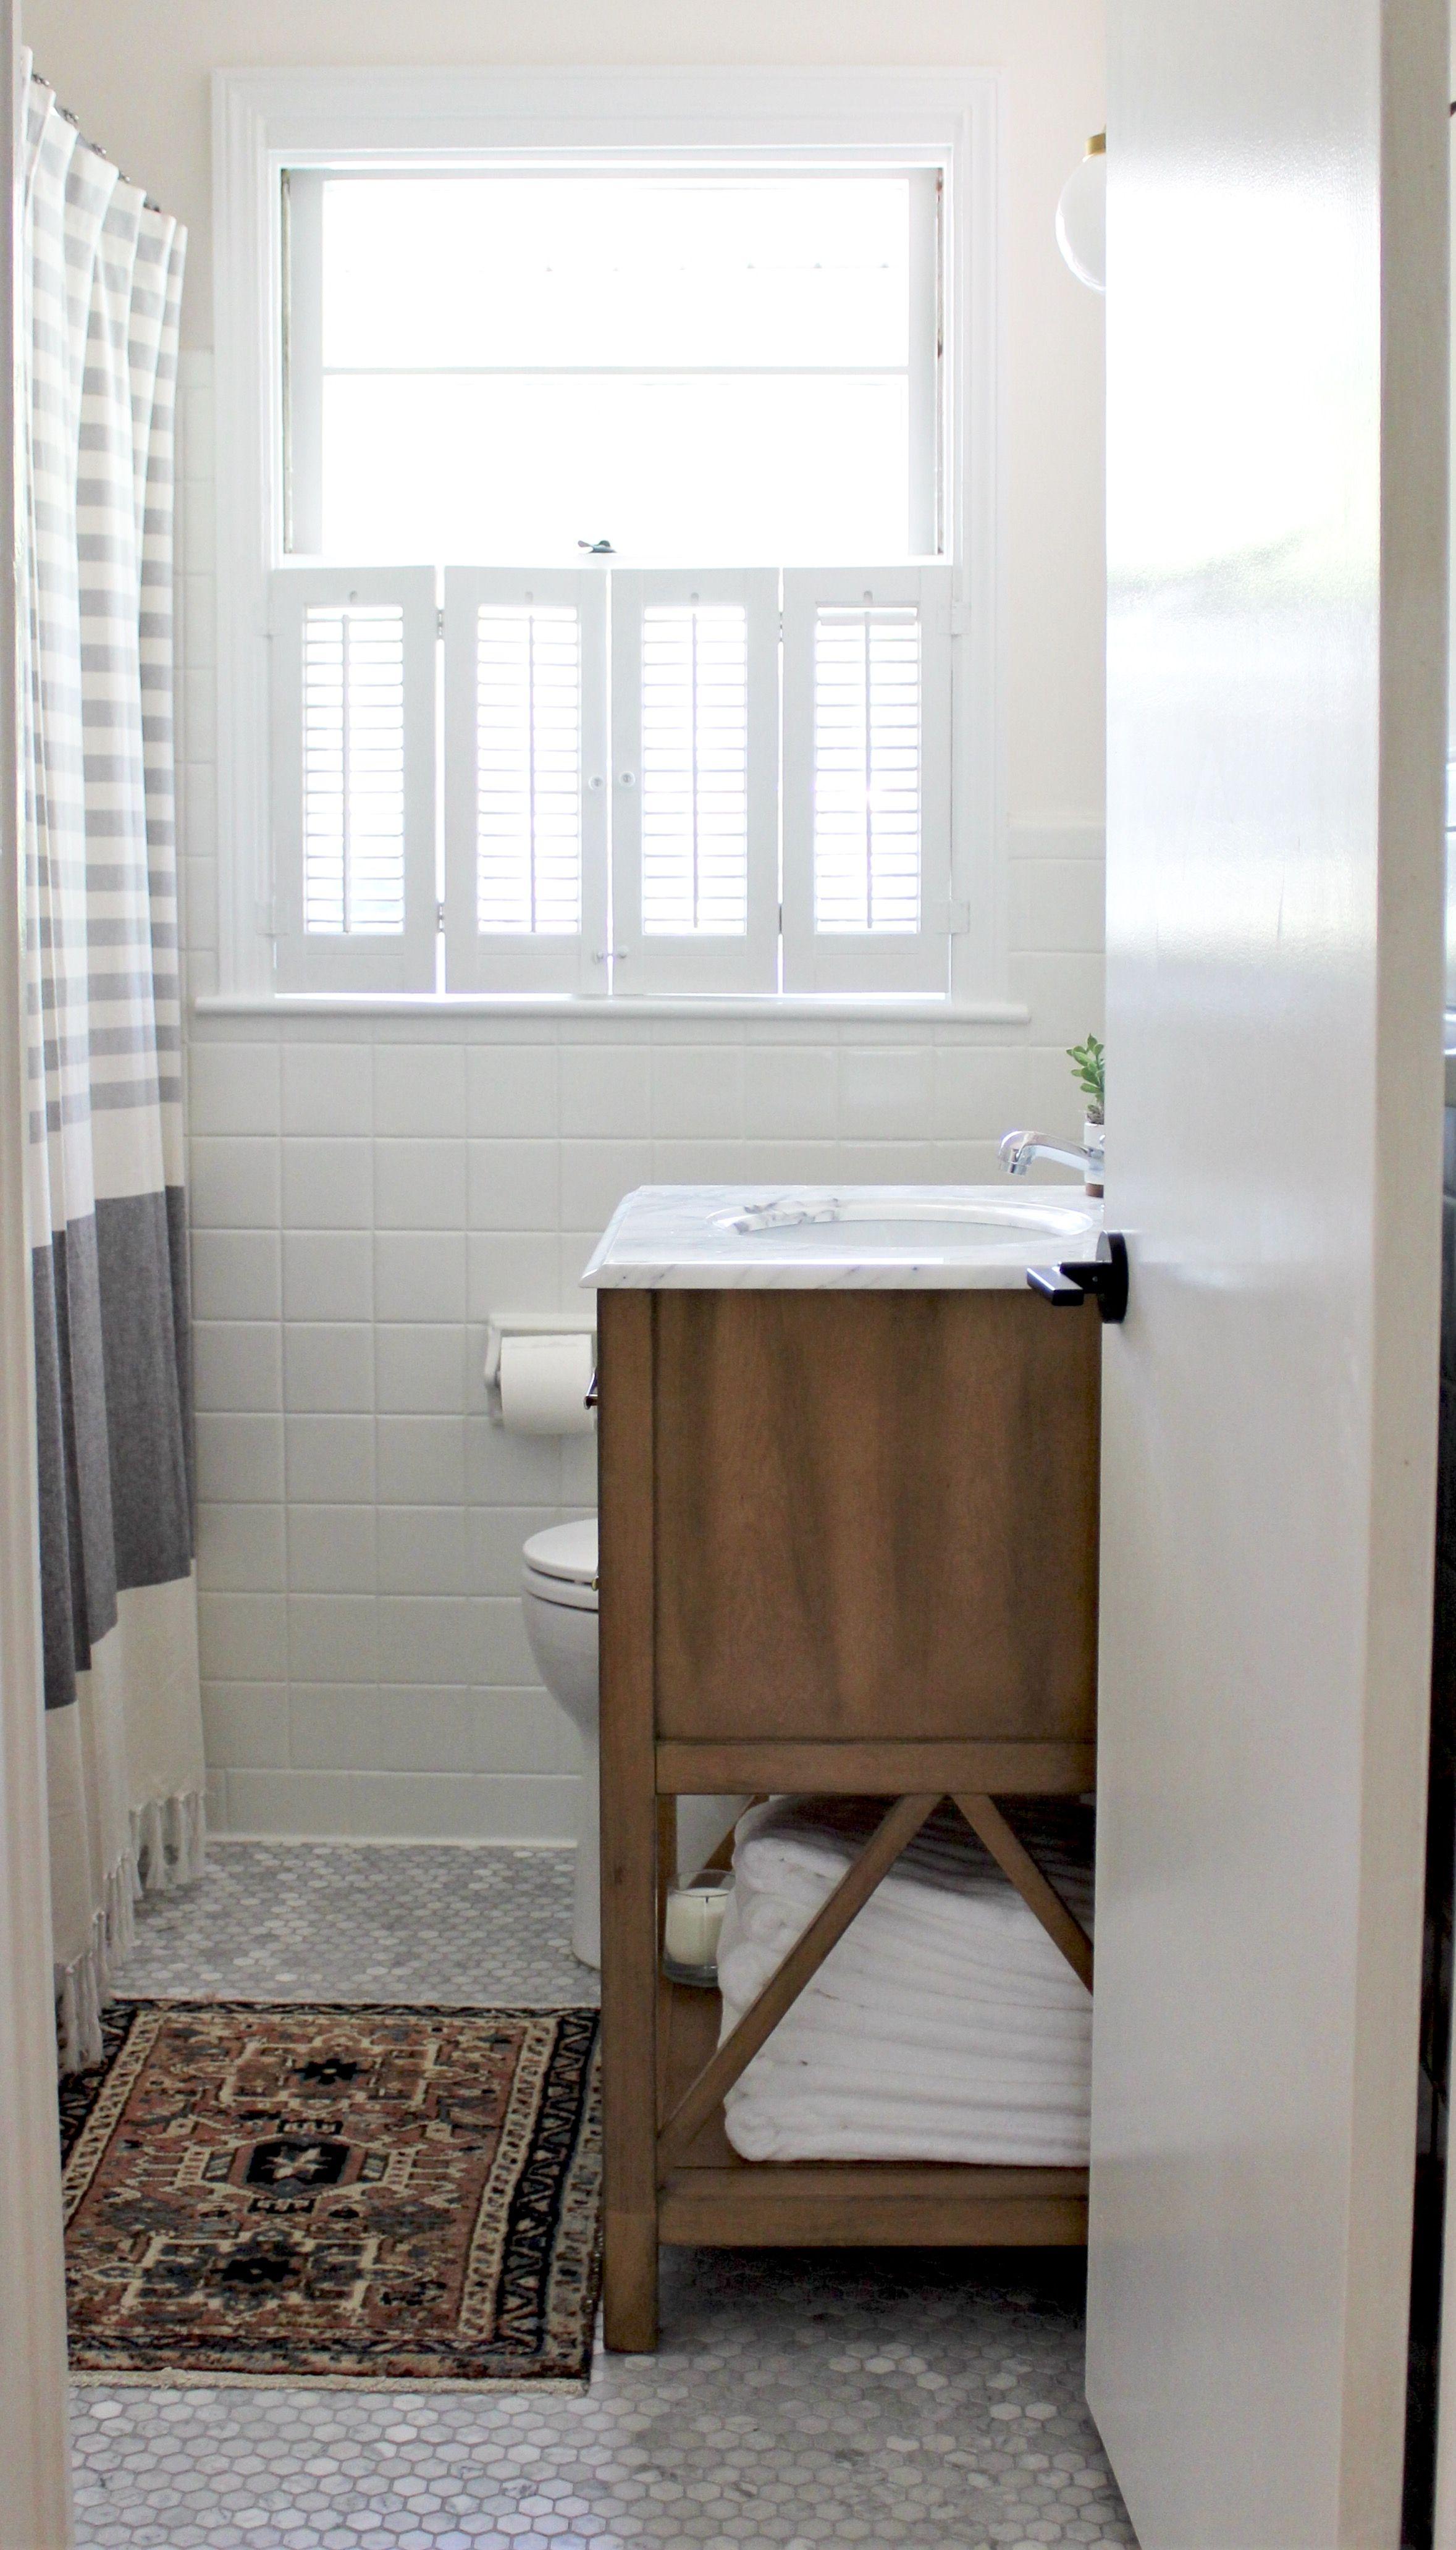 Eclectic mid-century bathroom renovation remodel decor design with ...